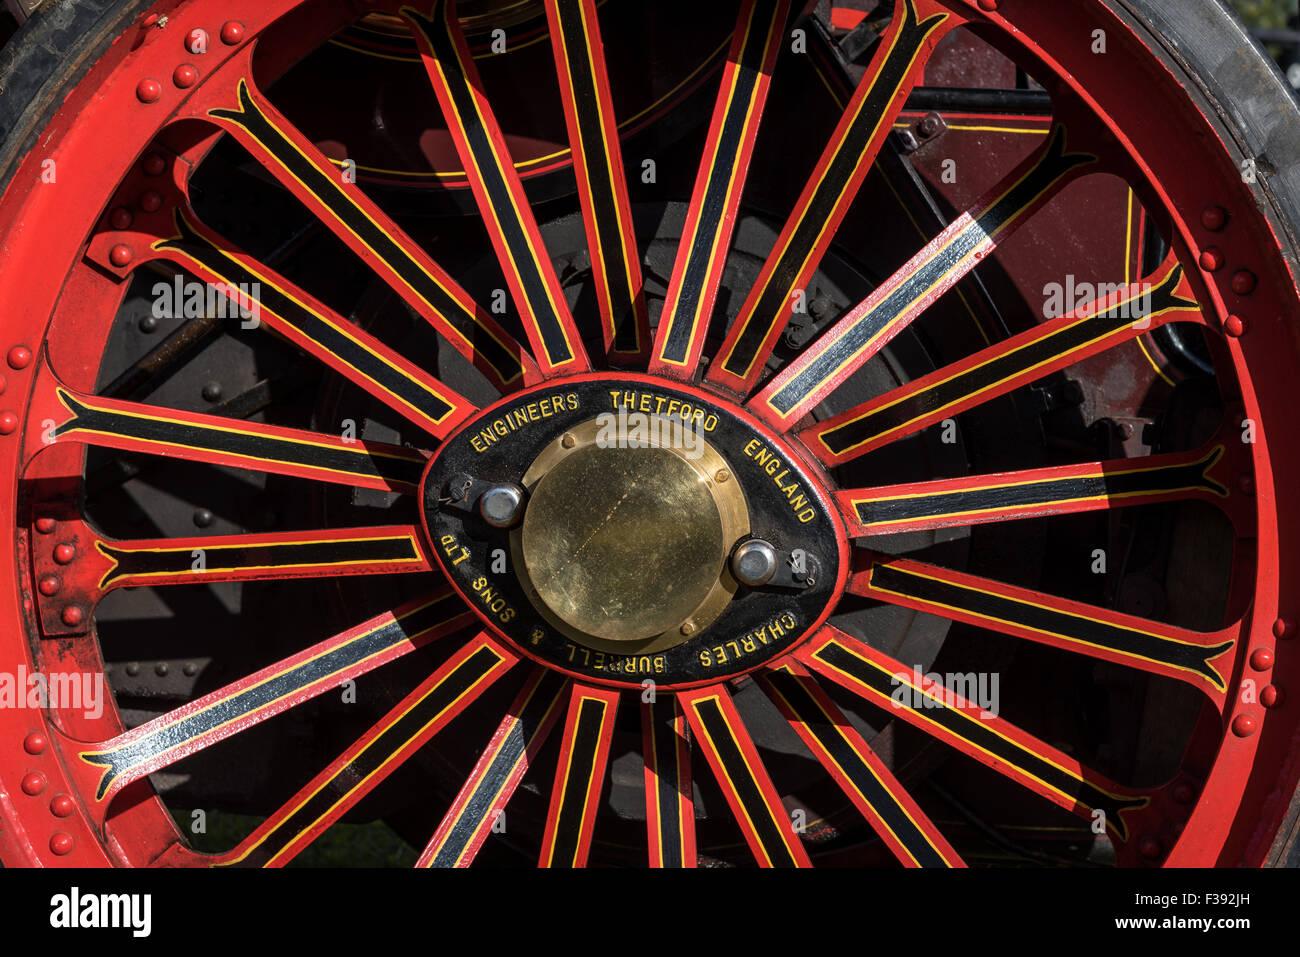 Vintage Steam Traction Locomotive Wheel - Stock Image